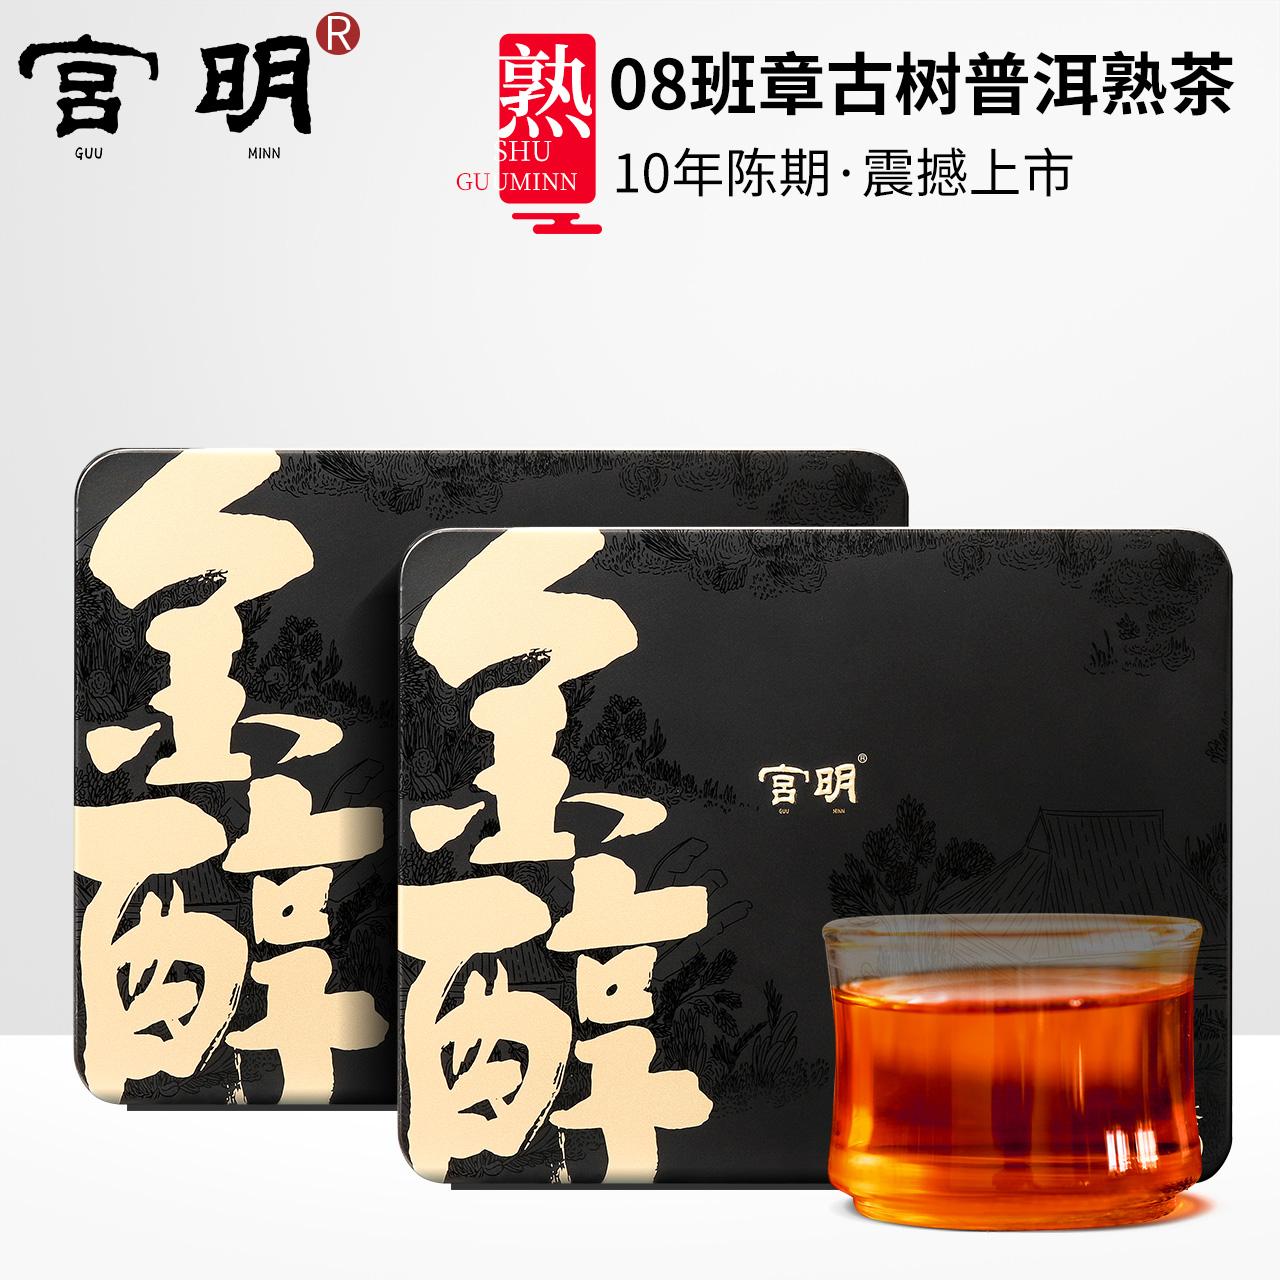 �m明茶�~ 08年老班章古�� 黑金限量版 金醇茶�u 云南普洱茶熟茶沱